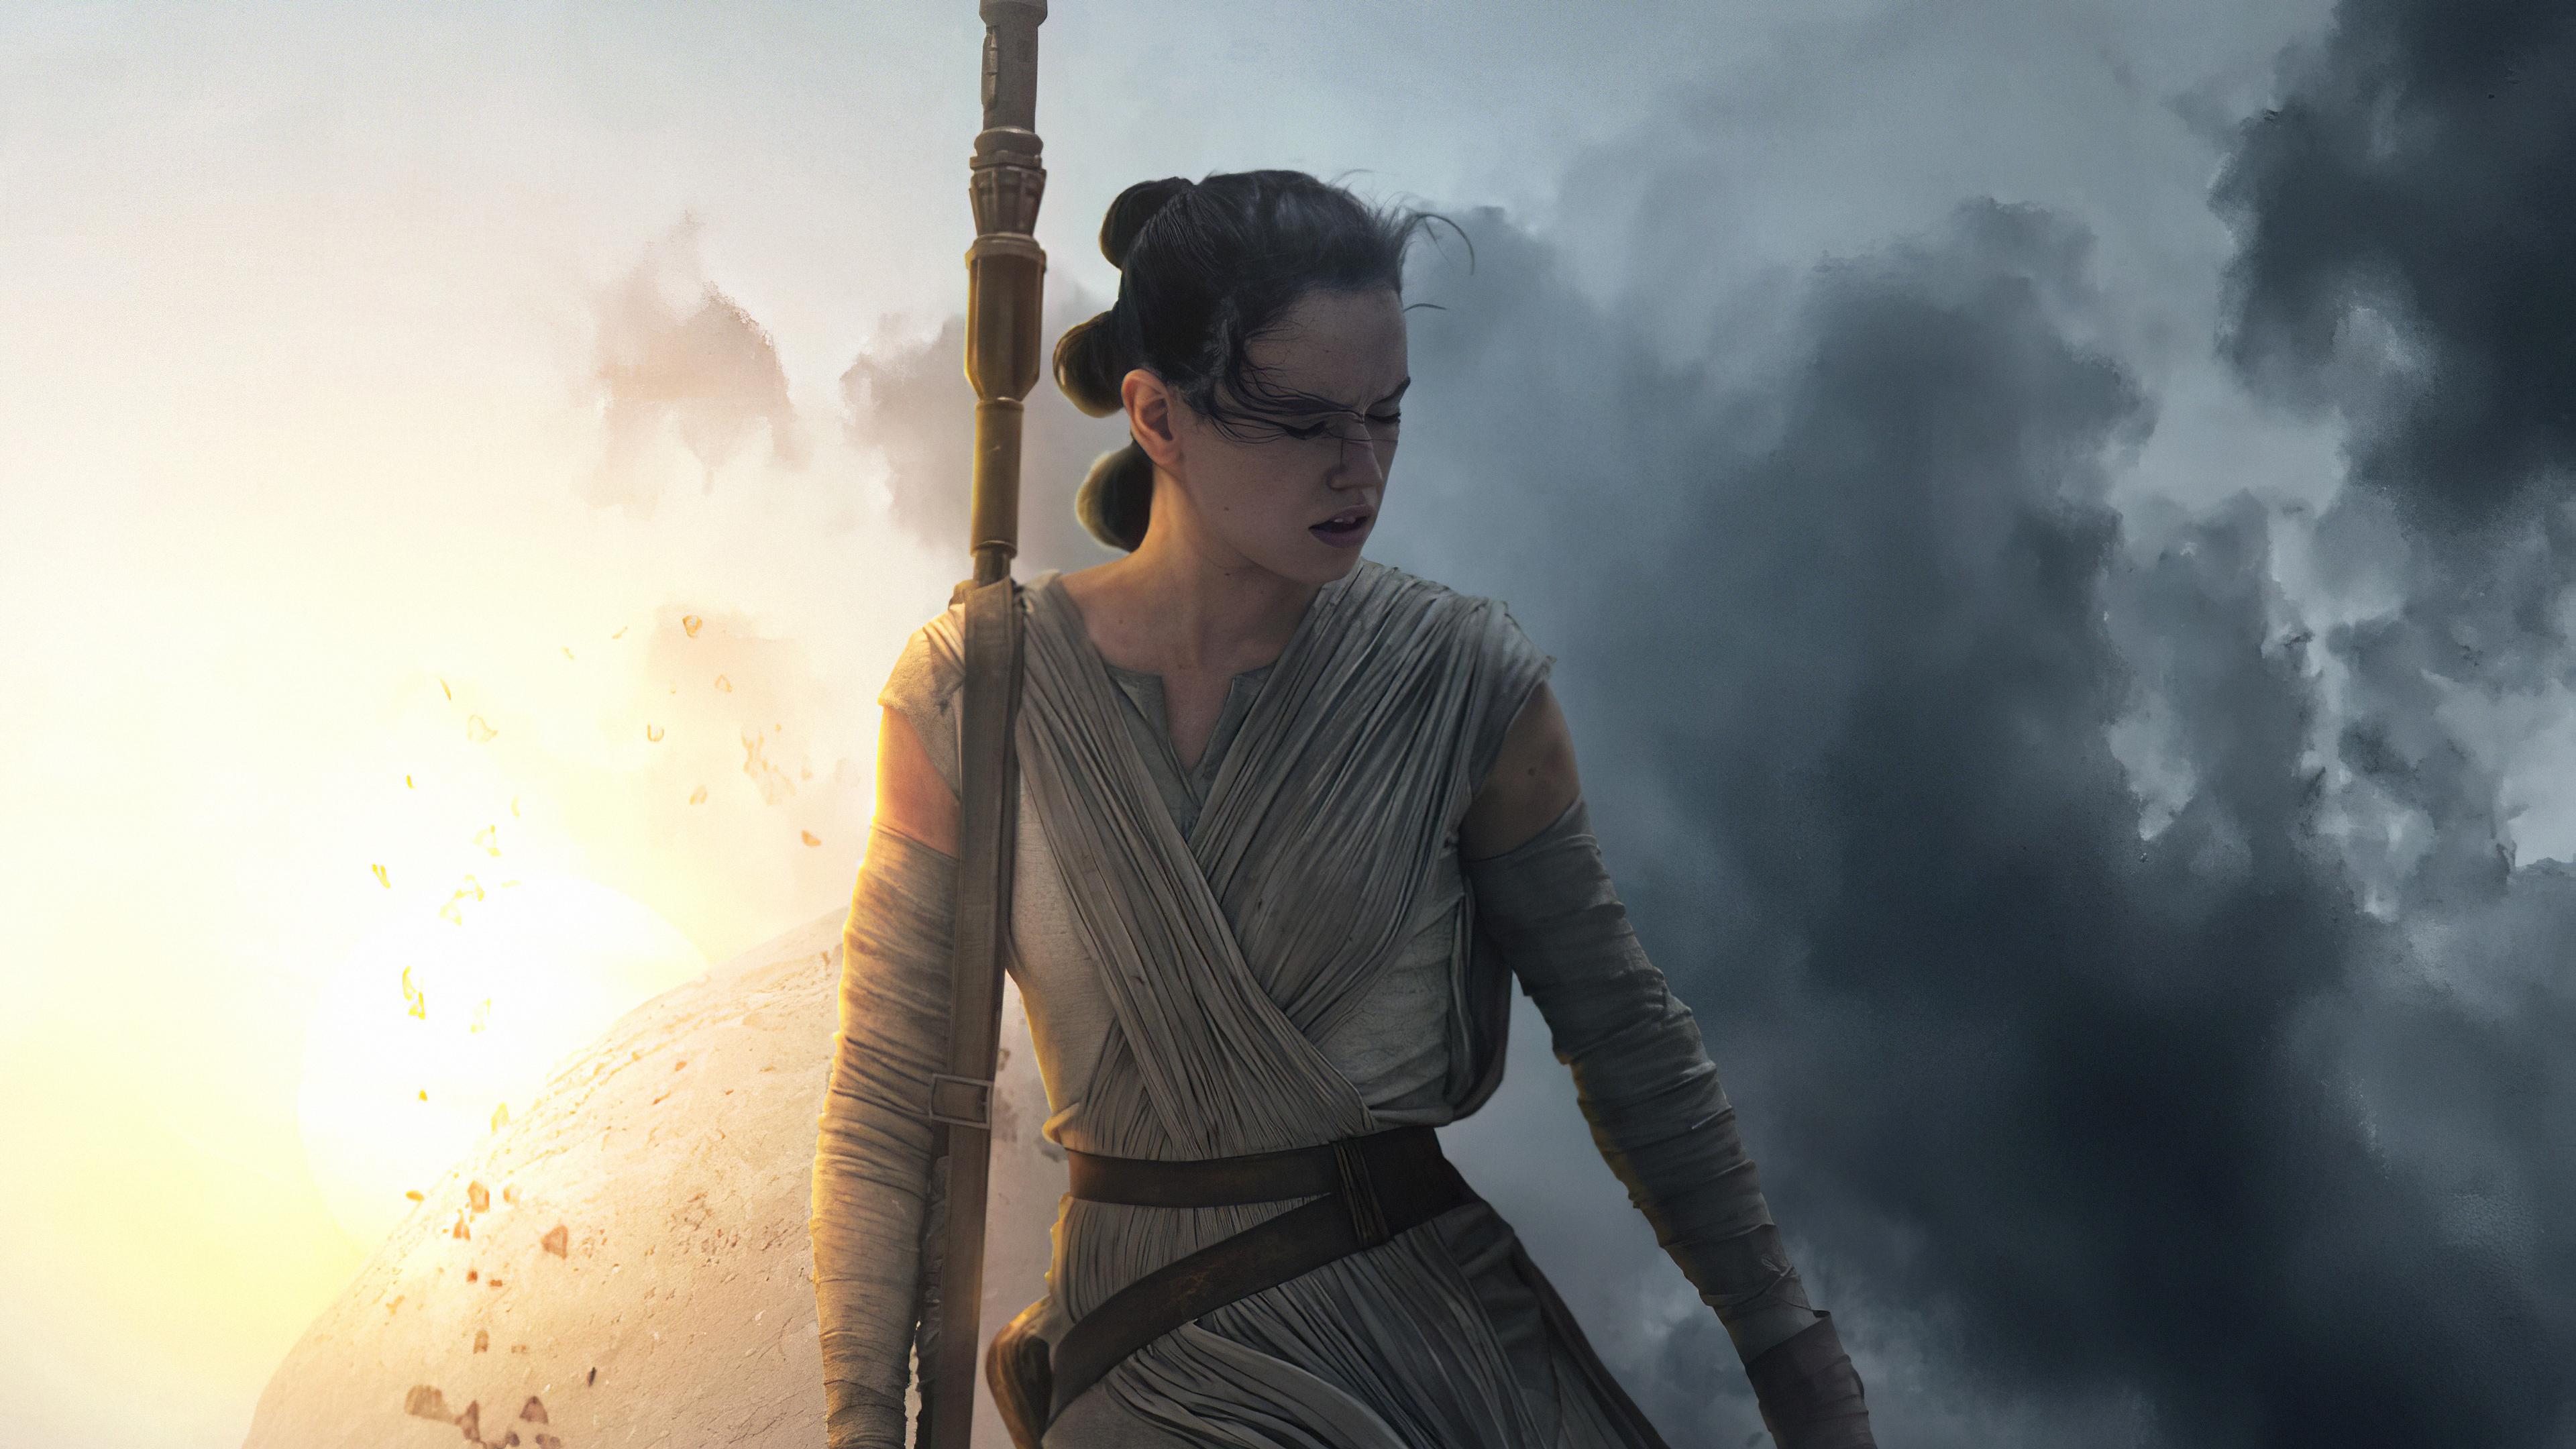 rey star wars the rise of skywalker 1575659817 - Rey Star Wars The Rise Of Skywalker -